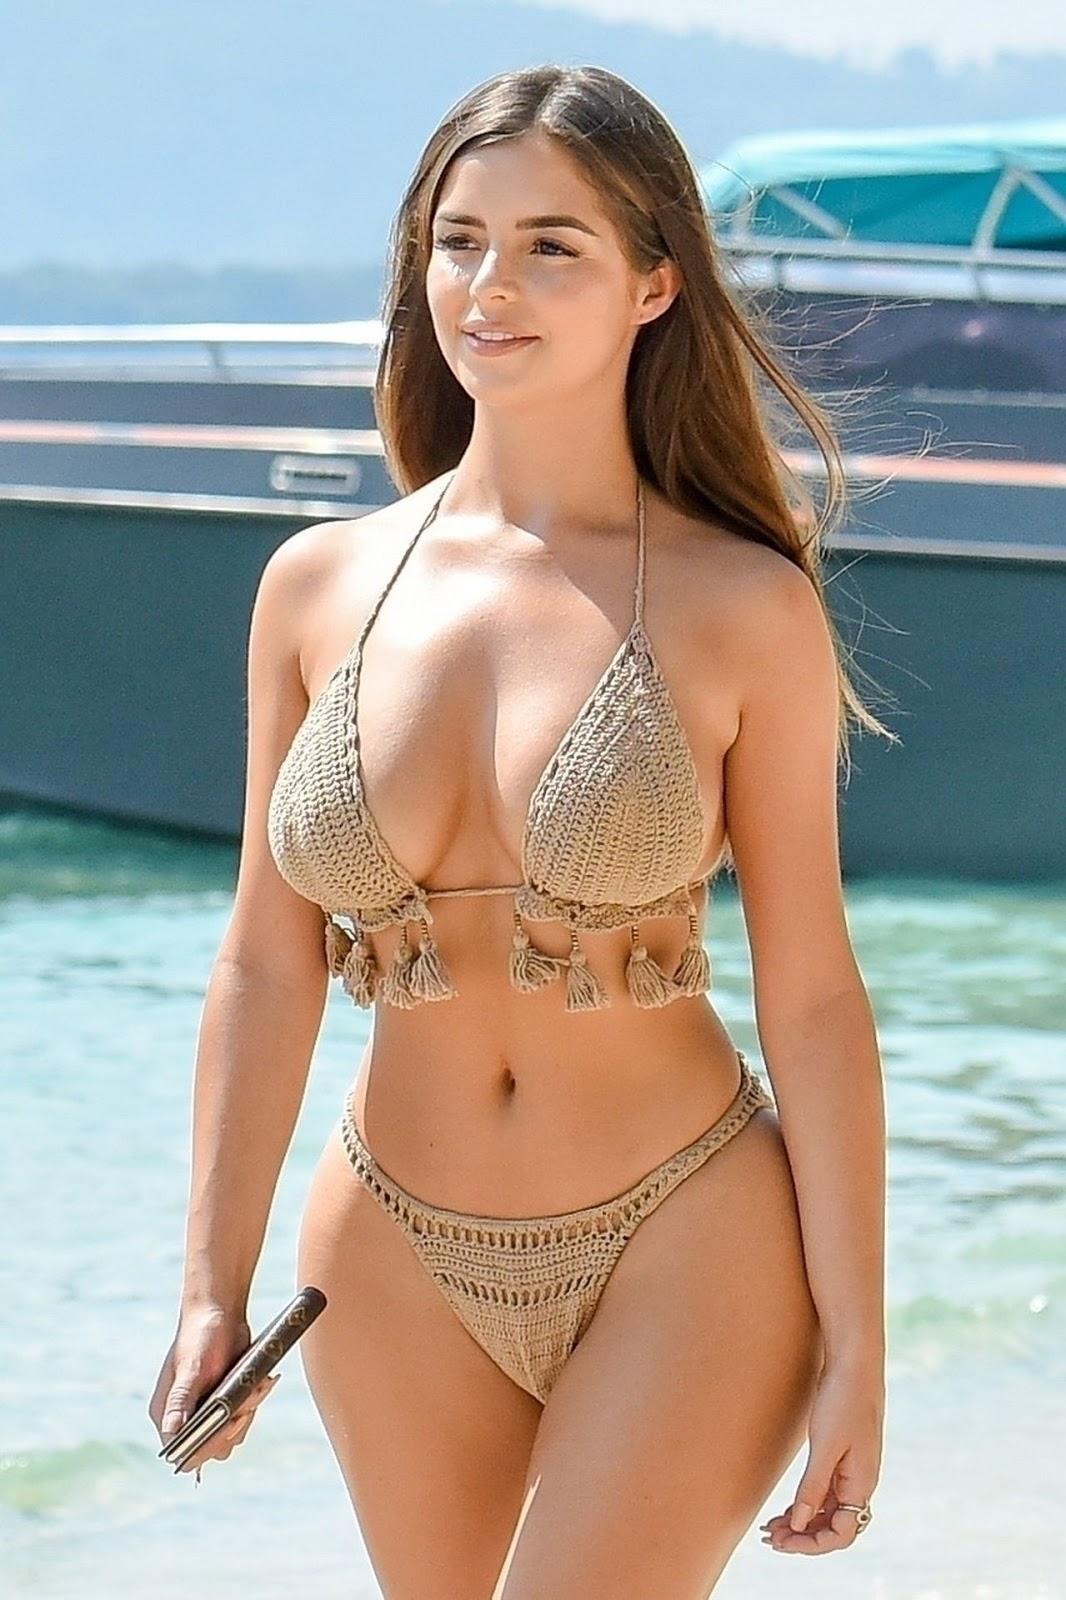 Demi Rose - On a beach in Phuket, Thailand - 02/07/2019